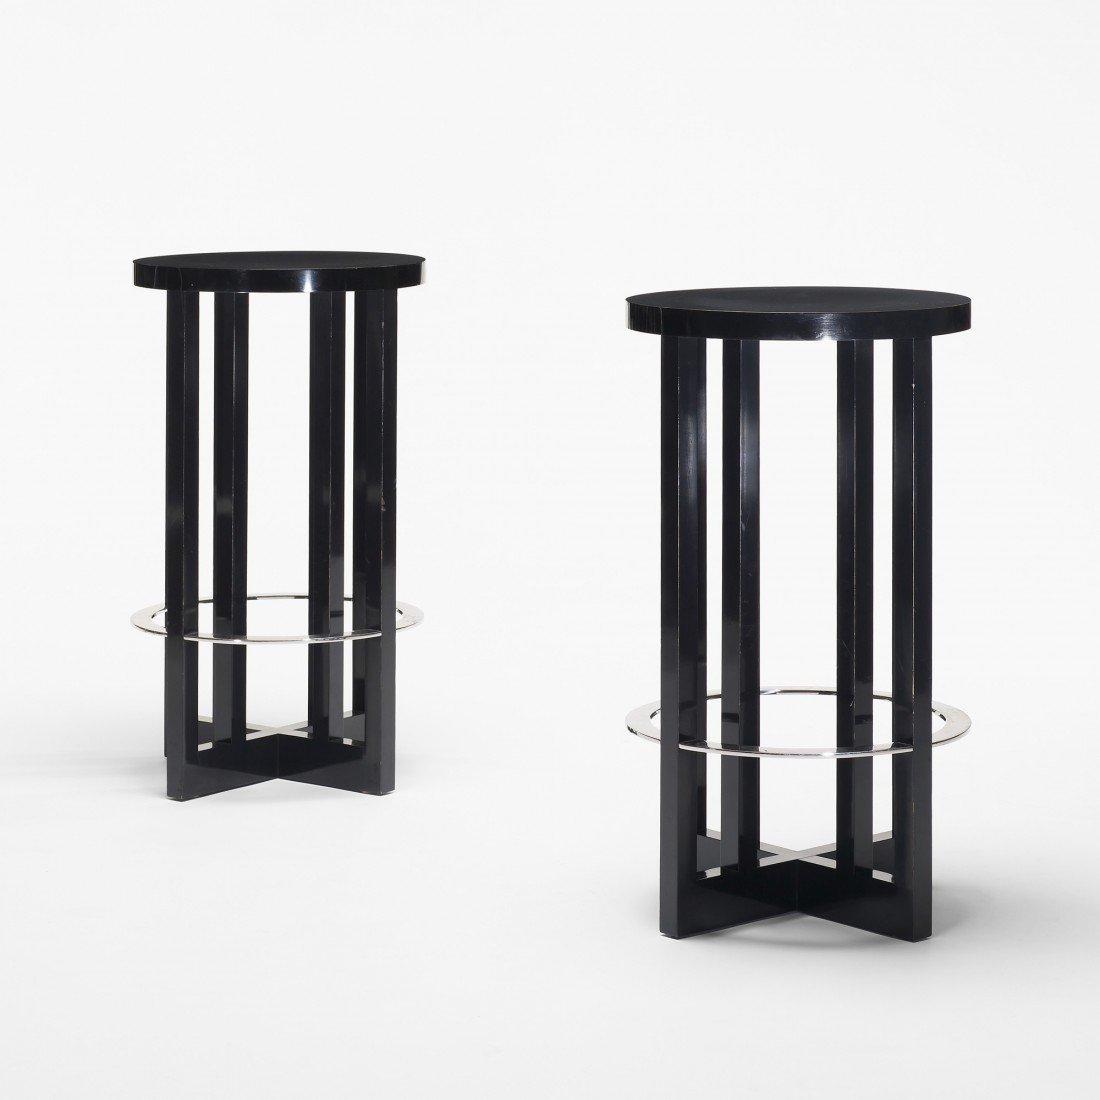 165: Richard Meier High Stools, pair